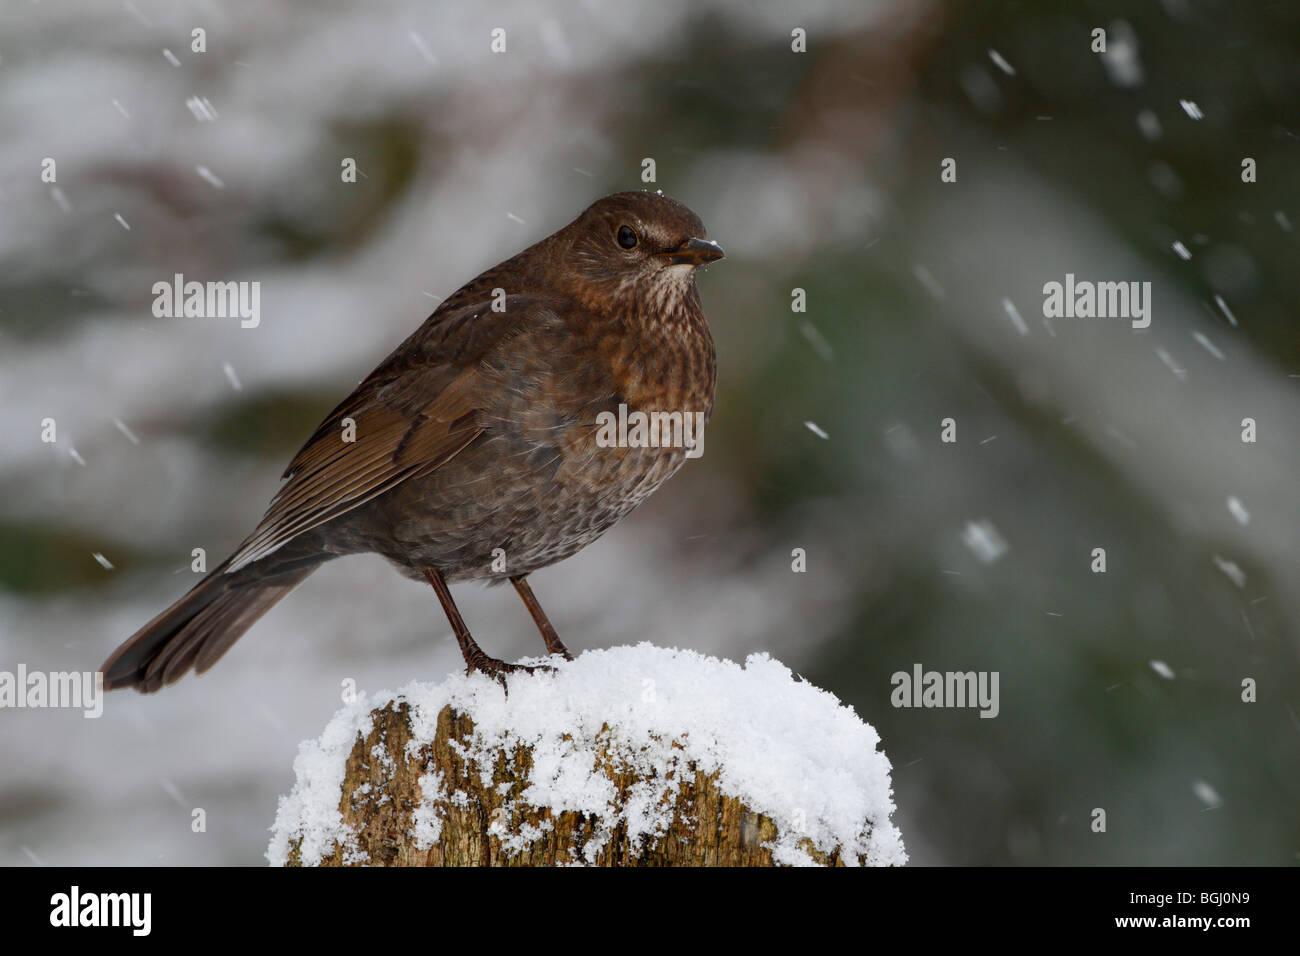 Blackbird Turdus merula in snow fall - Stock Image